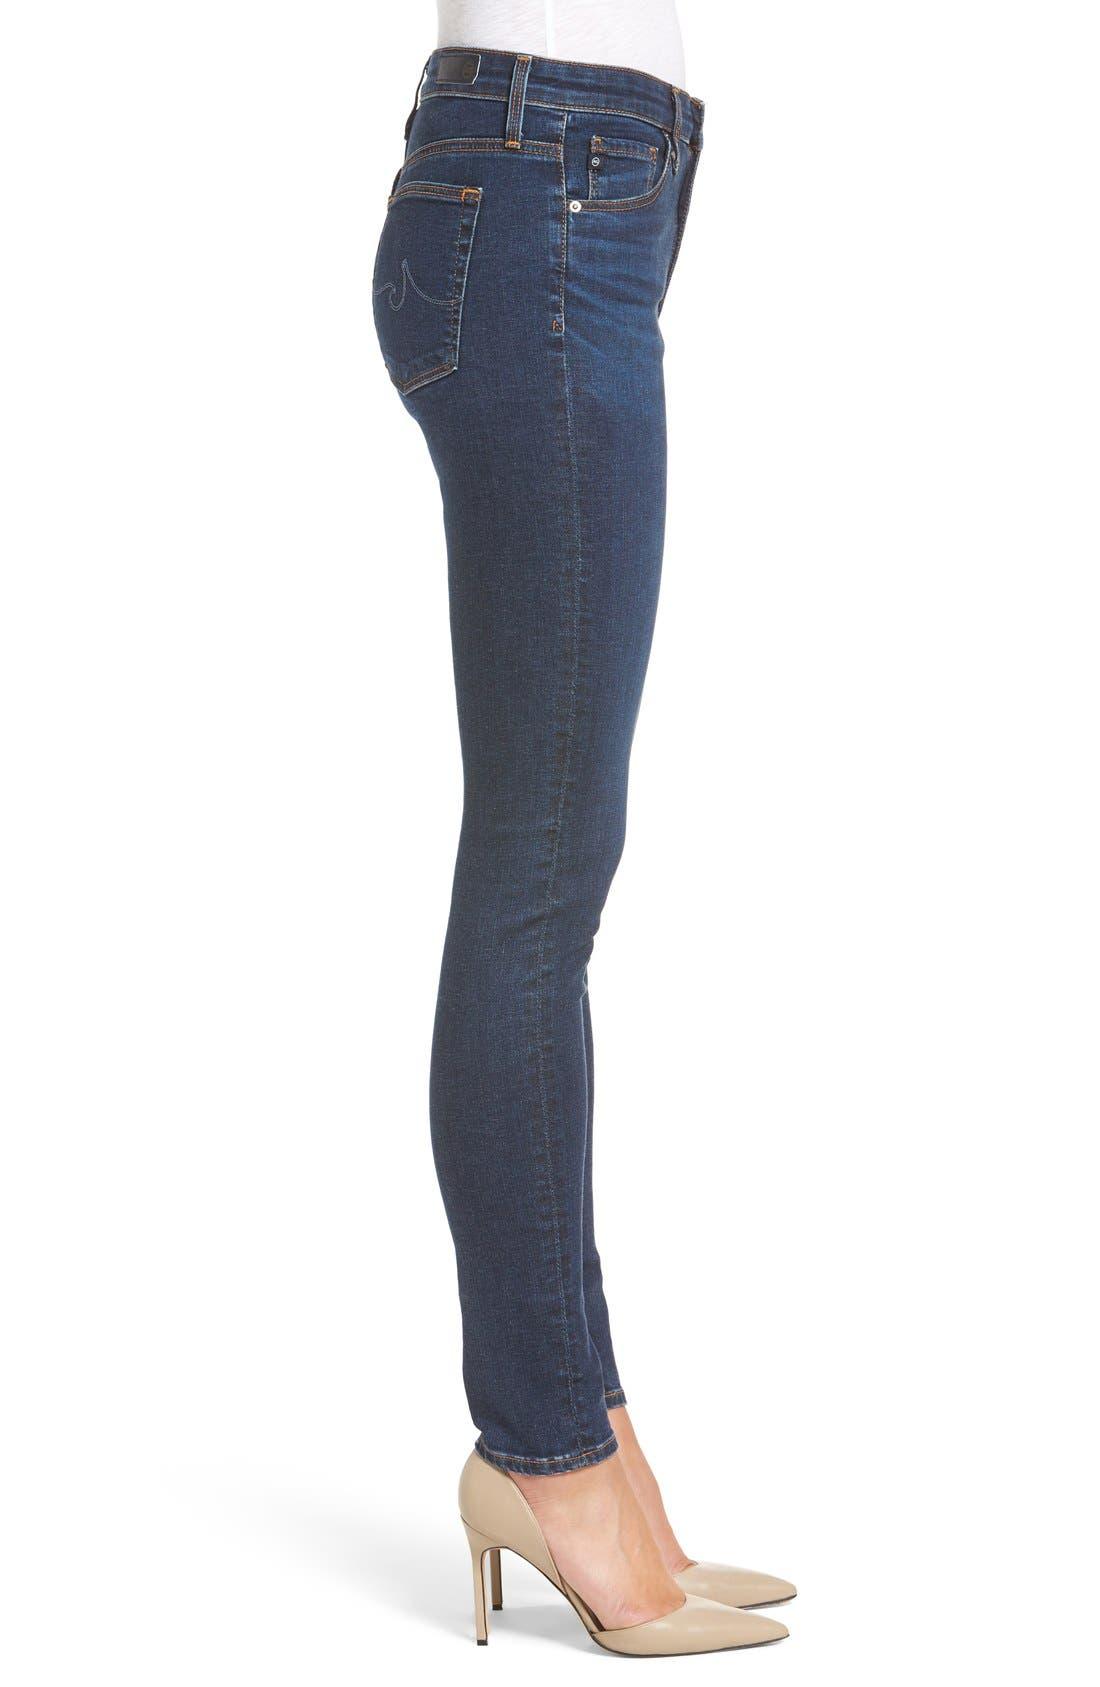 'The Farrah' High Rise Skinny Jeans,                             Alternate thumbnail 47, color,